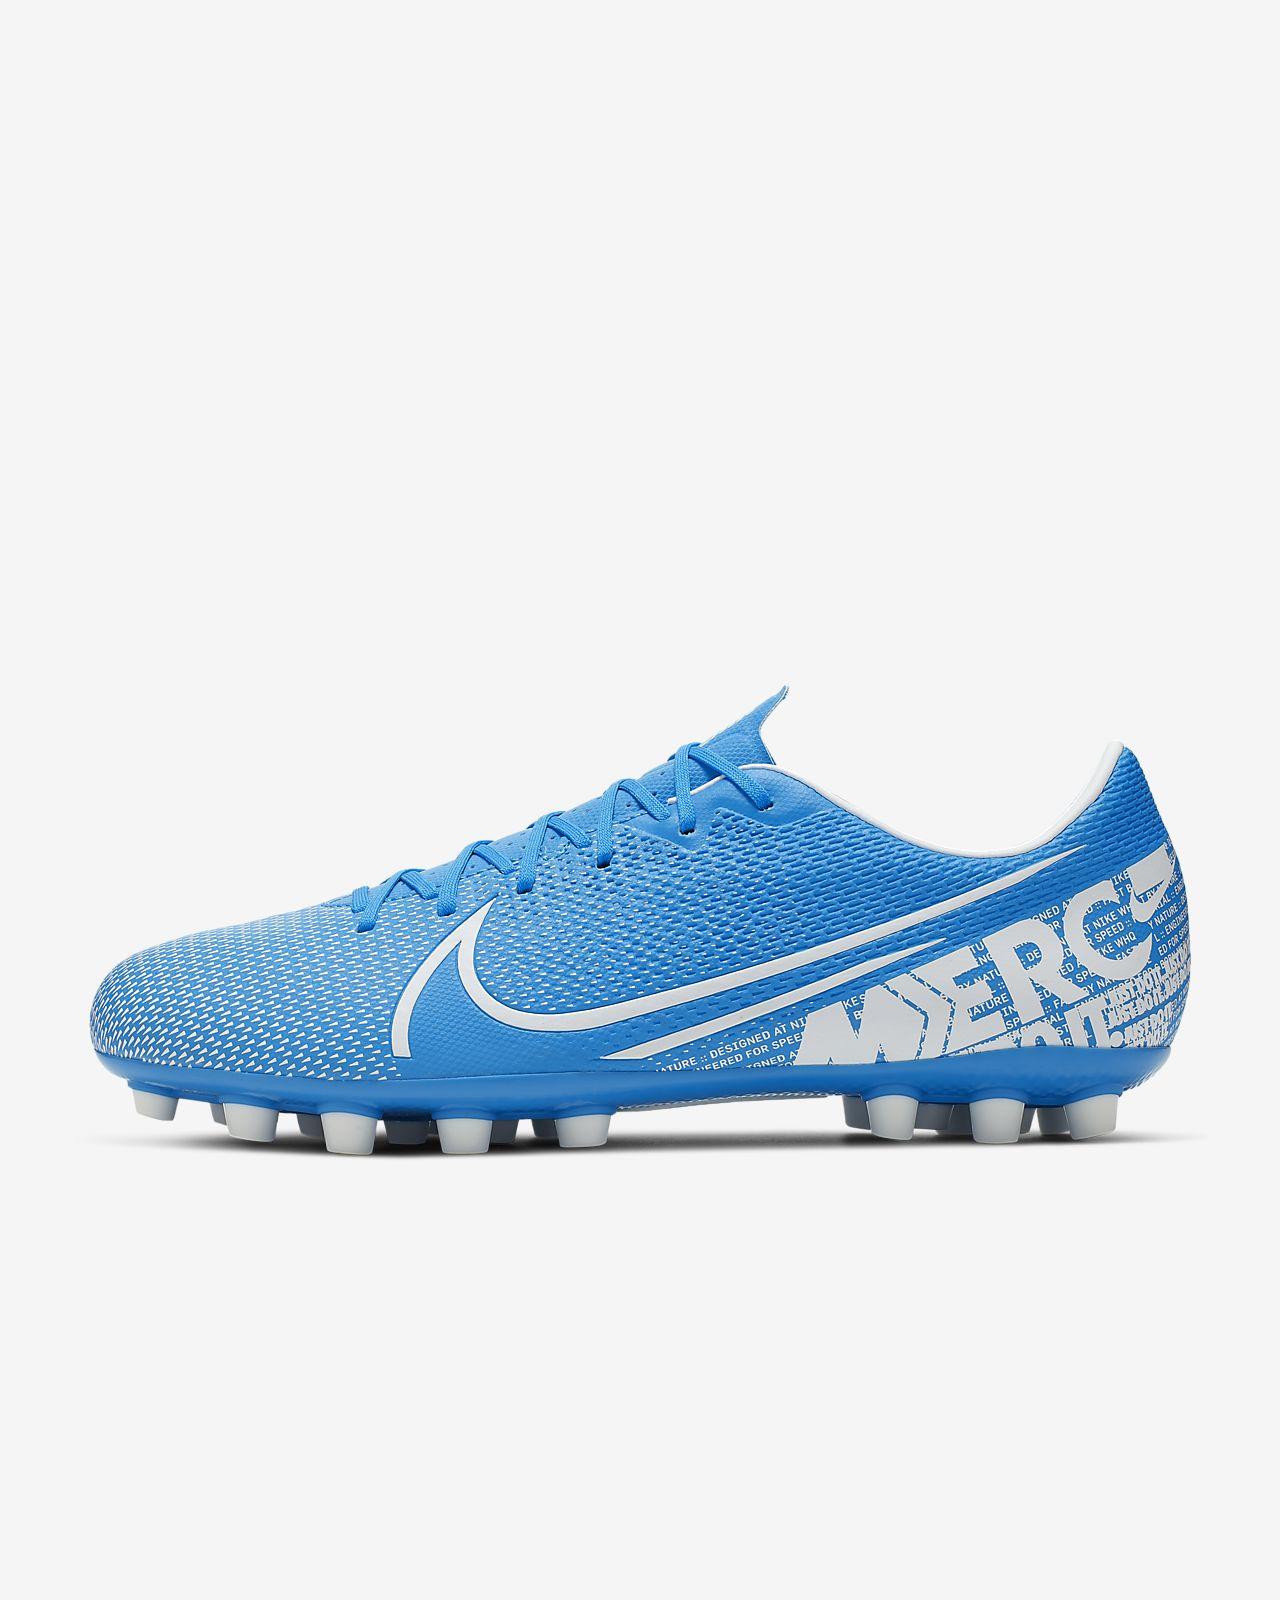 Nike Mercurial Vapor 13 Academy AG Botas de fútbol para césped artificial